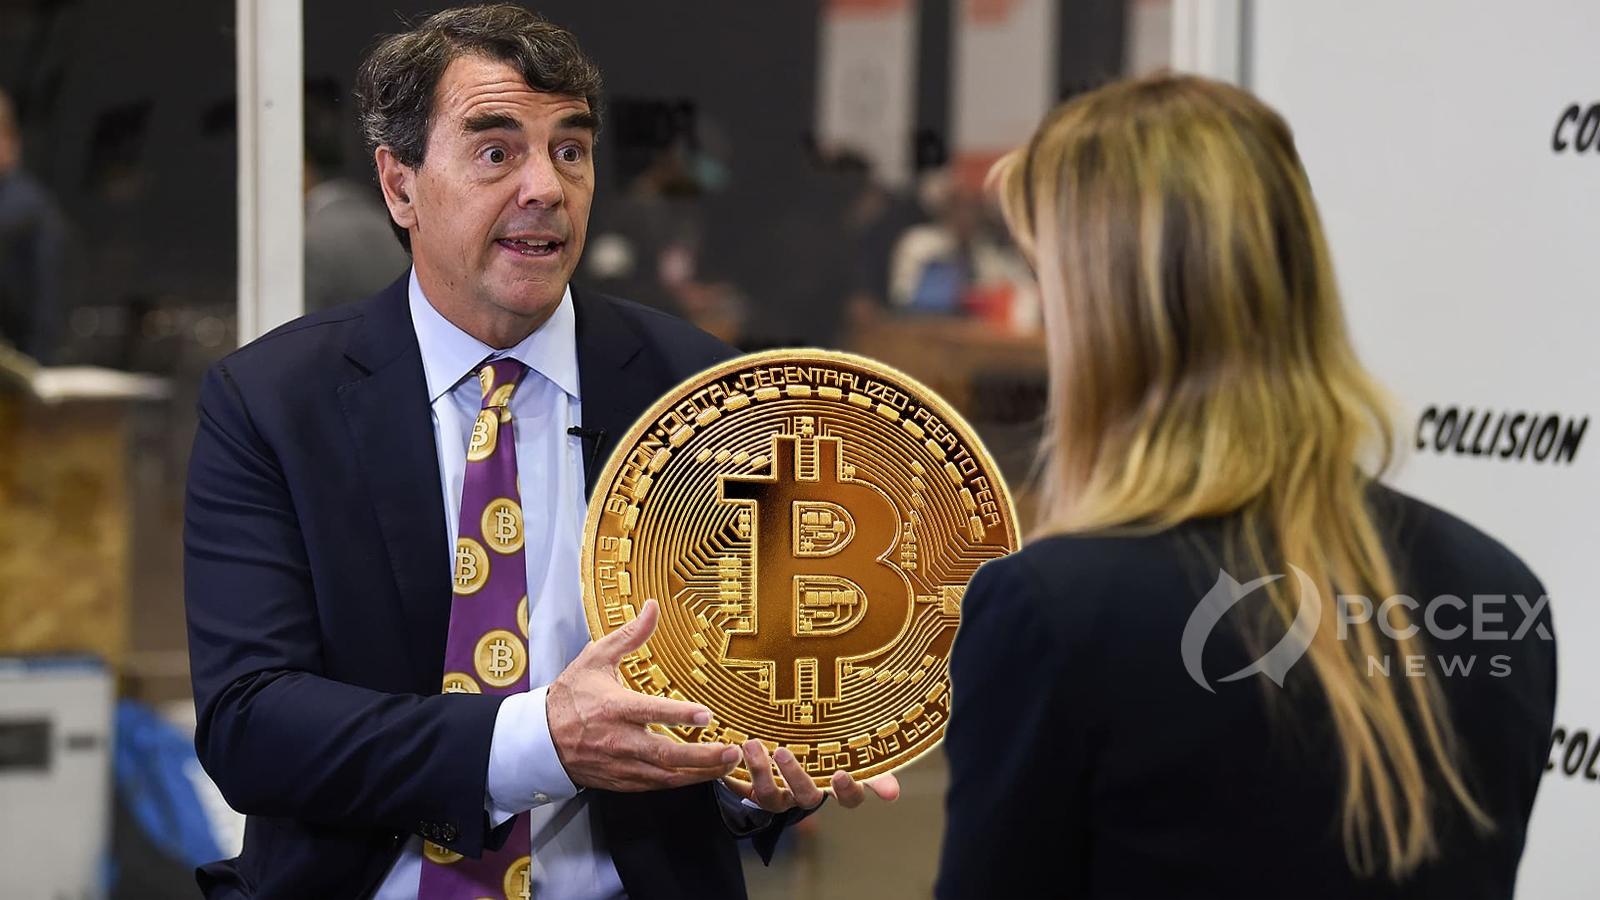 Billionaire Tim Draper Thinks Bitcoin Price Will Still Hit $250,000